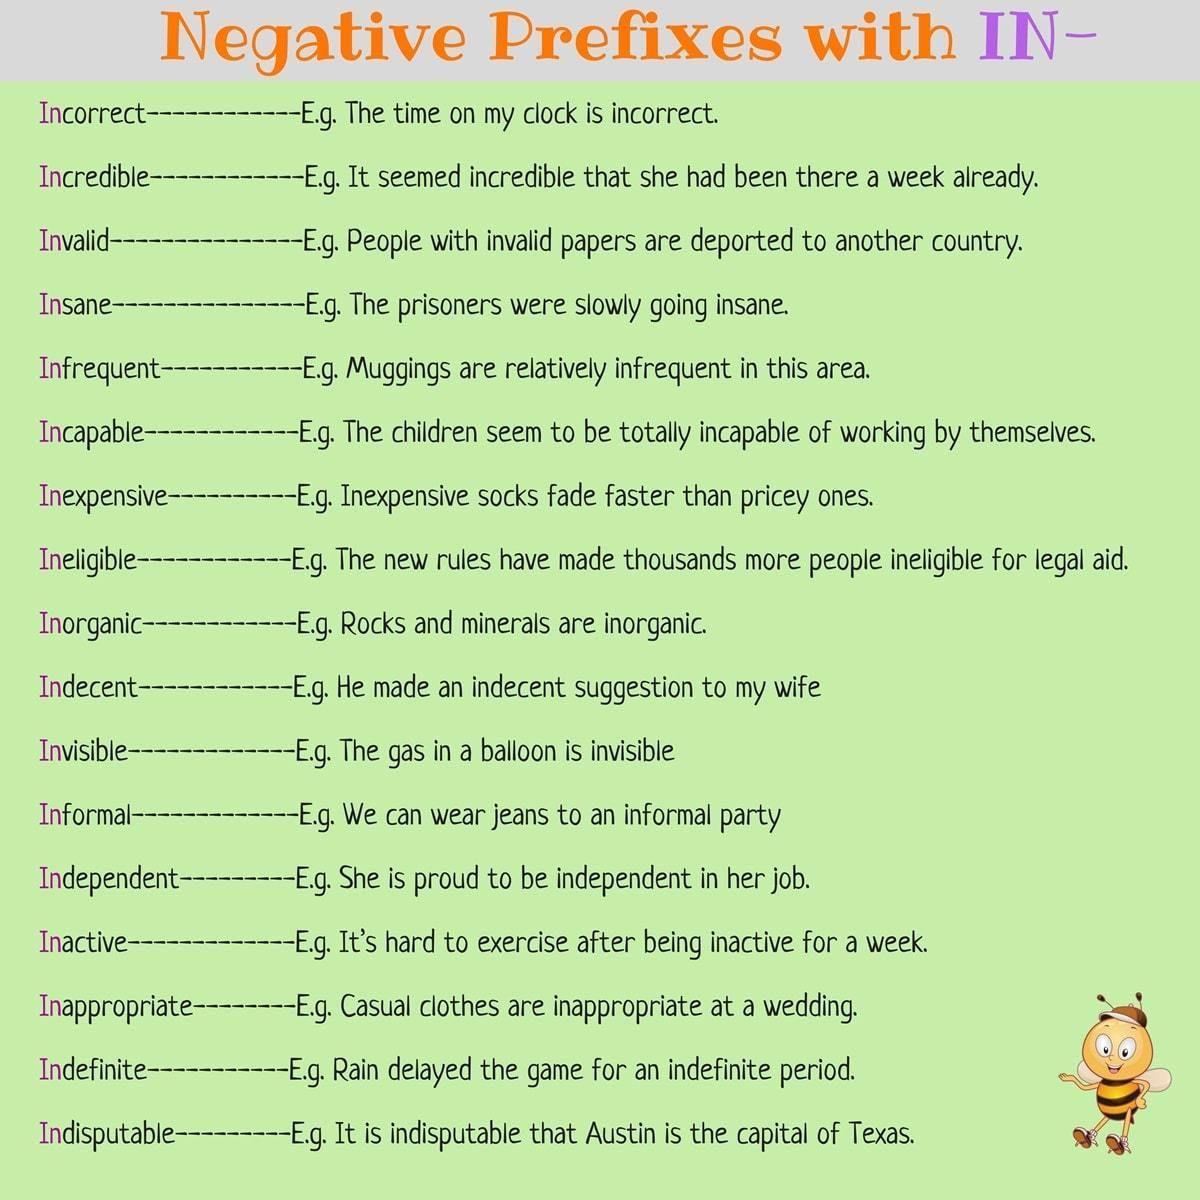 Negative Prefixes In